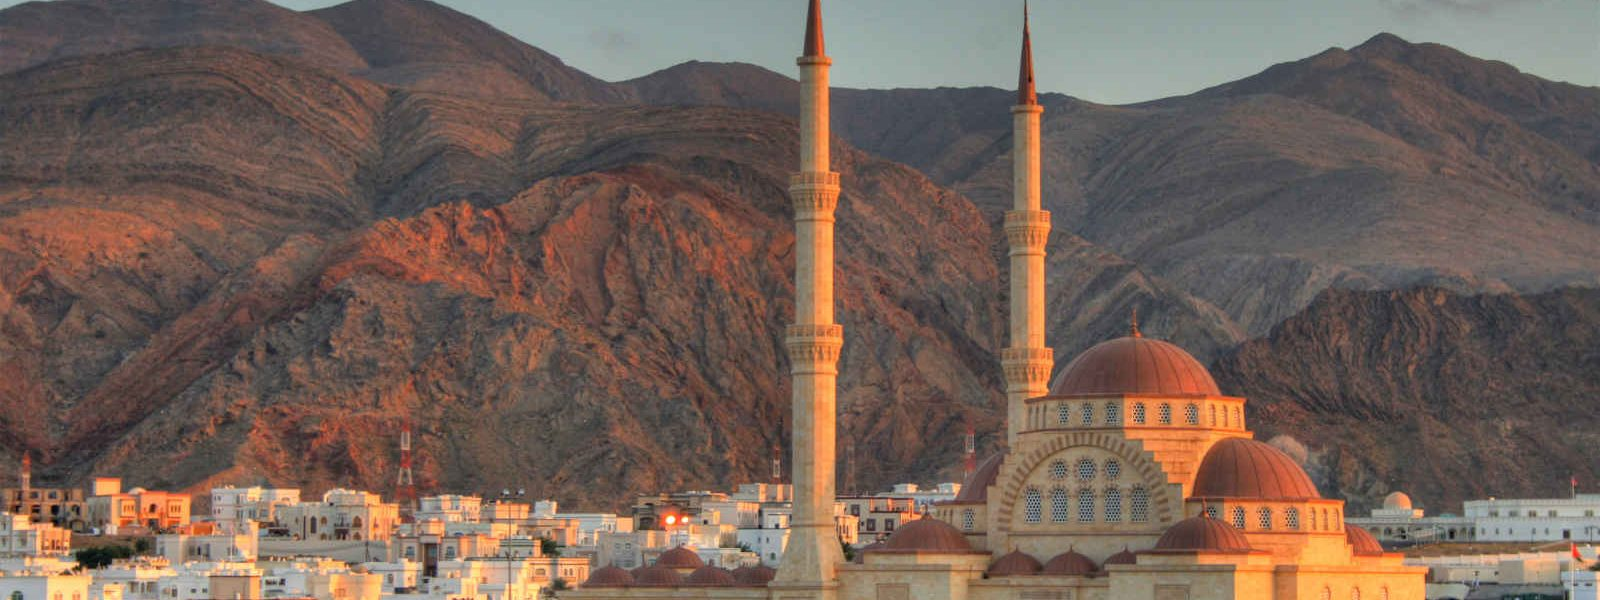 Mosquée, Mascate, Oman